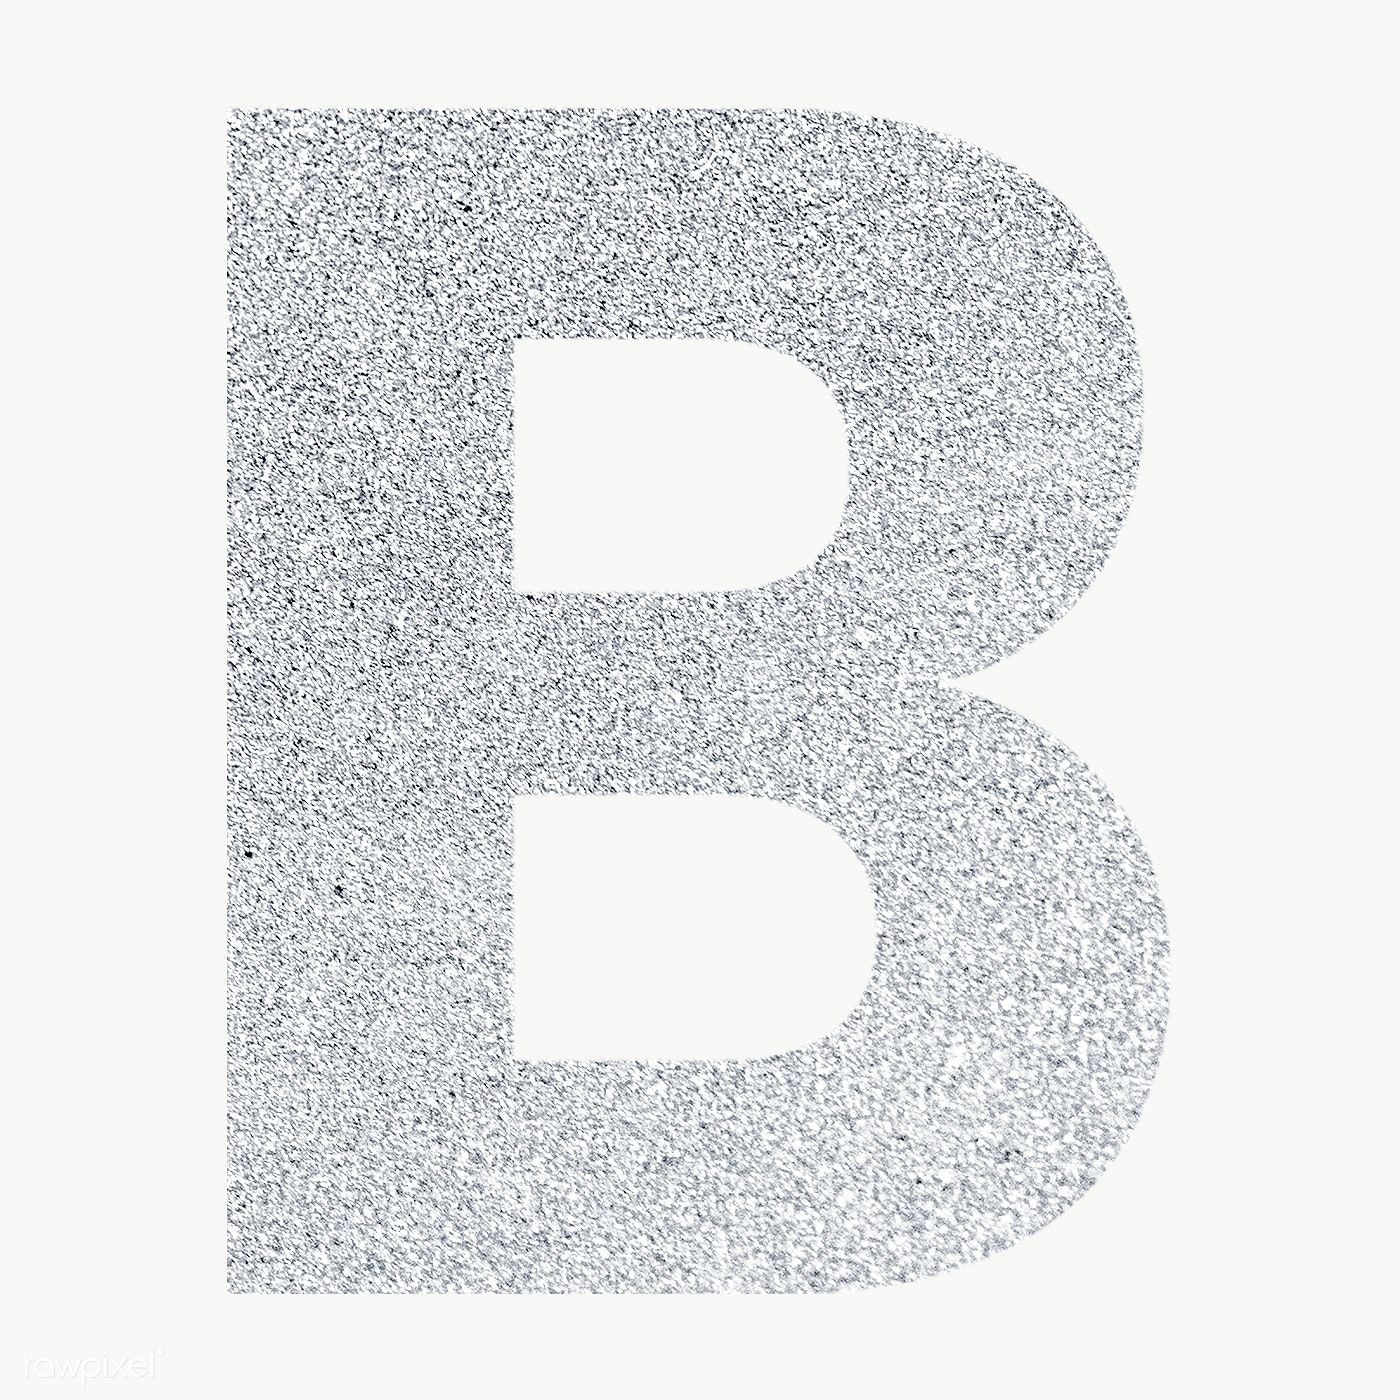 Glitter Capital Letter B Sticker Transparent Png Free Image By Rawpixel Com Ningzk V Letter B Transparent Stickers Lettering